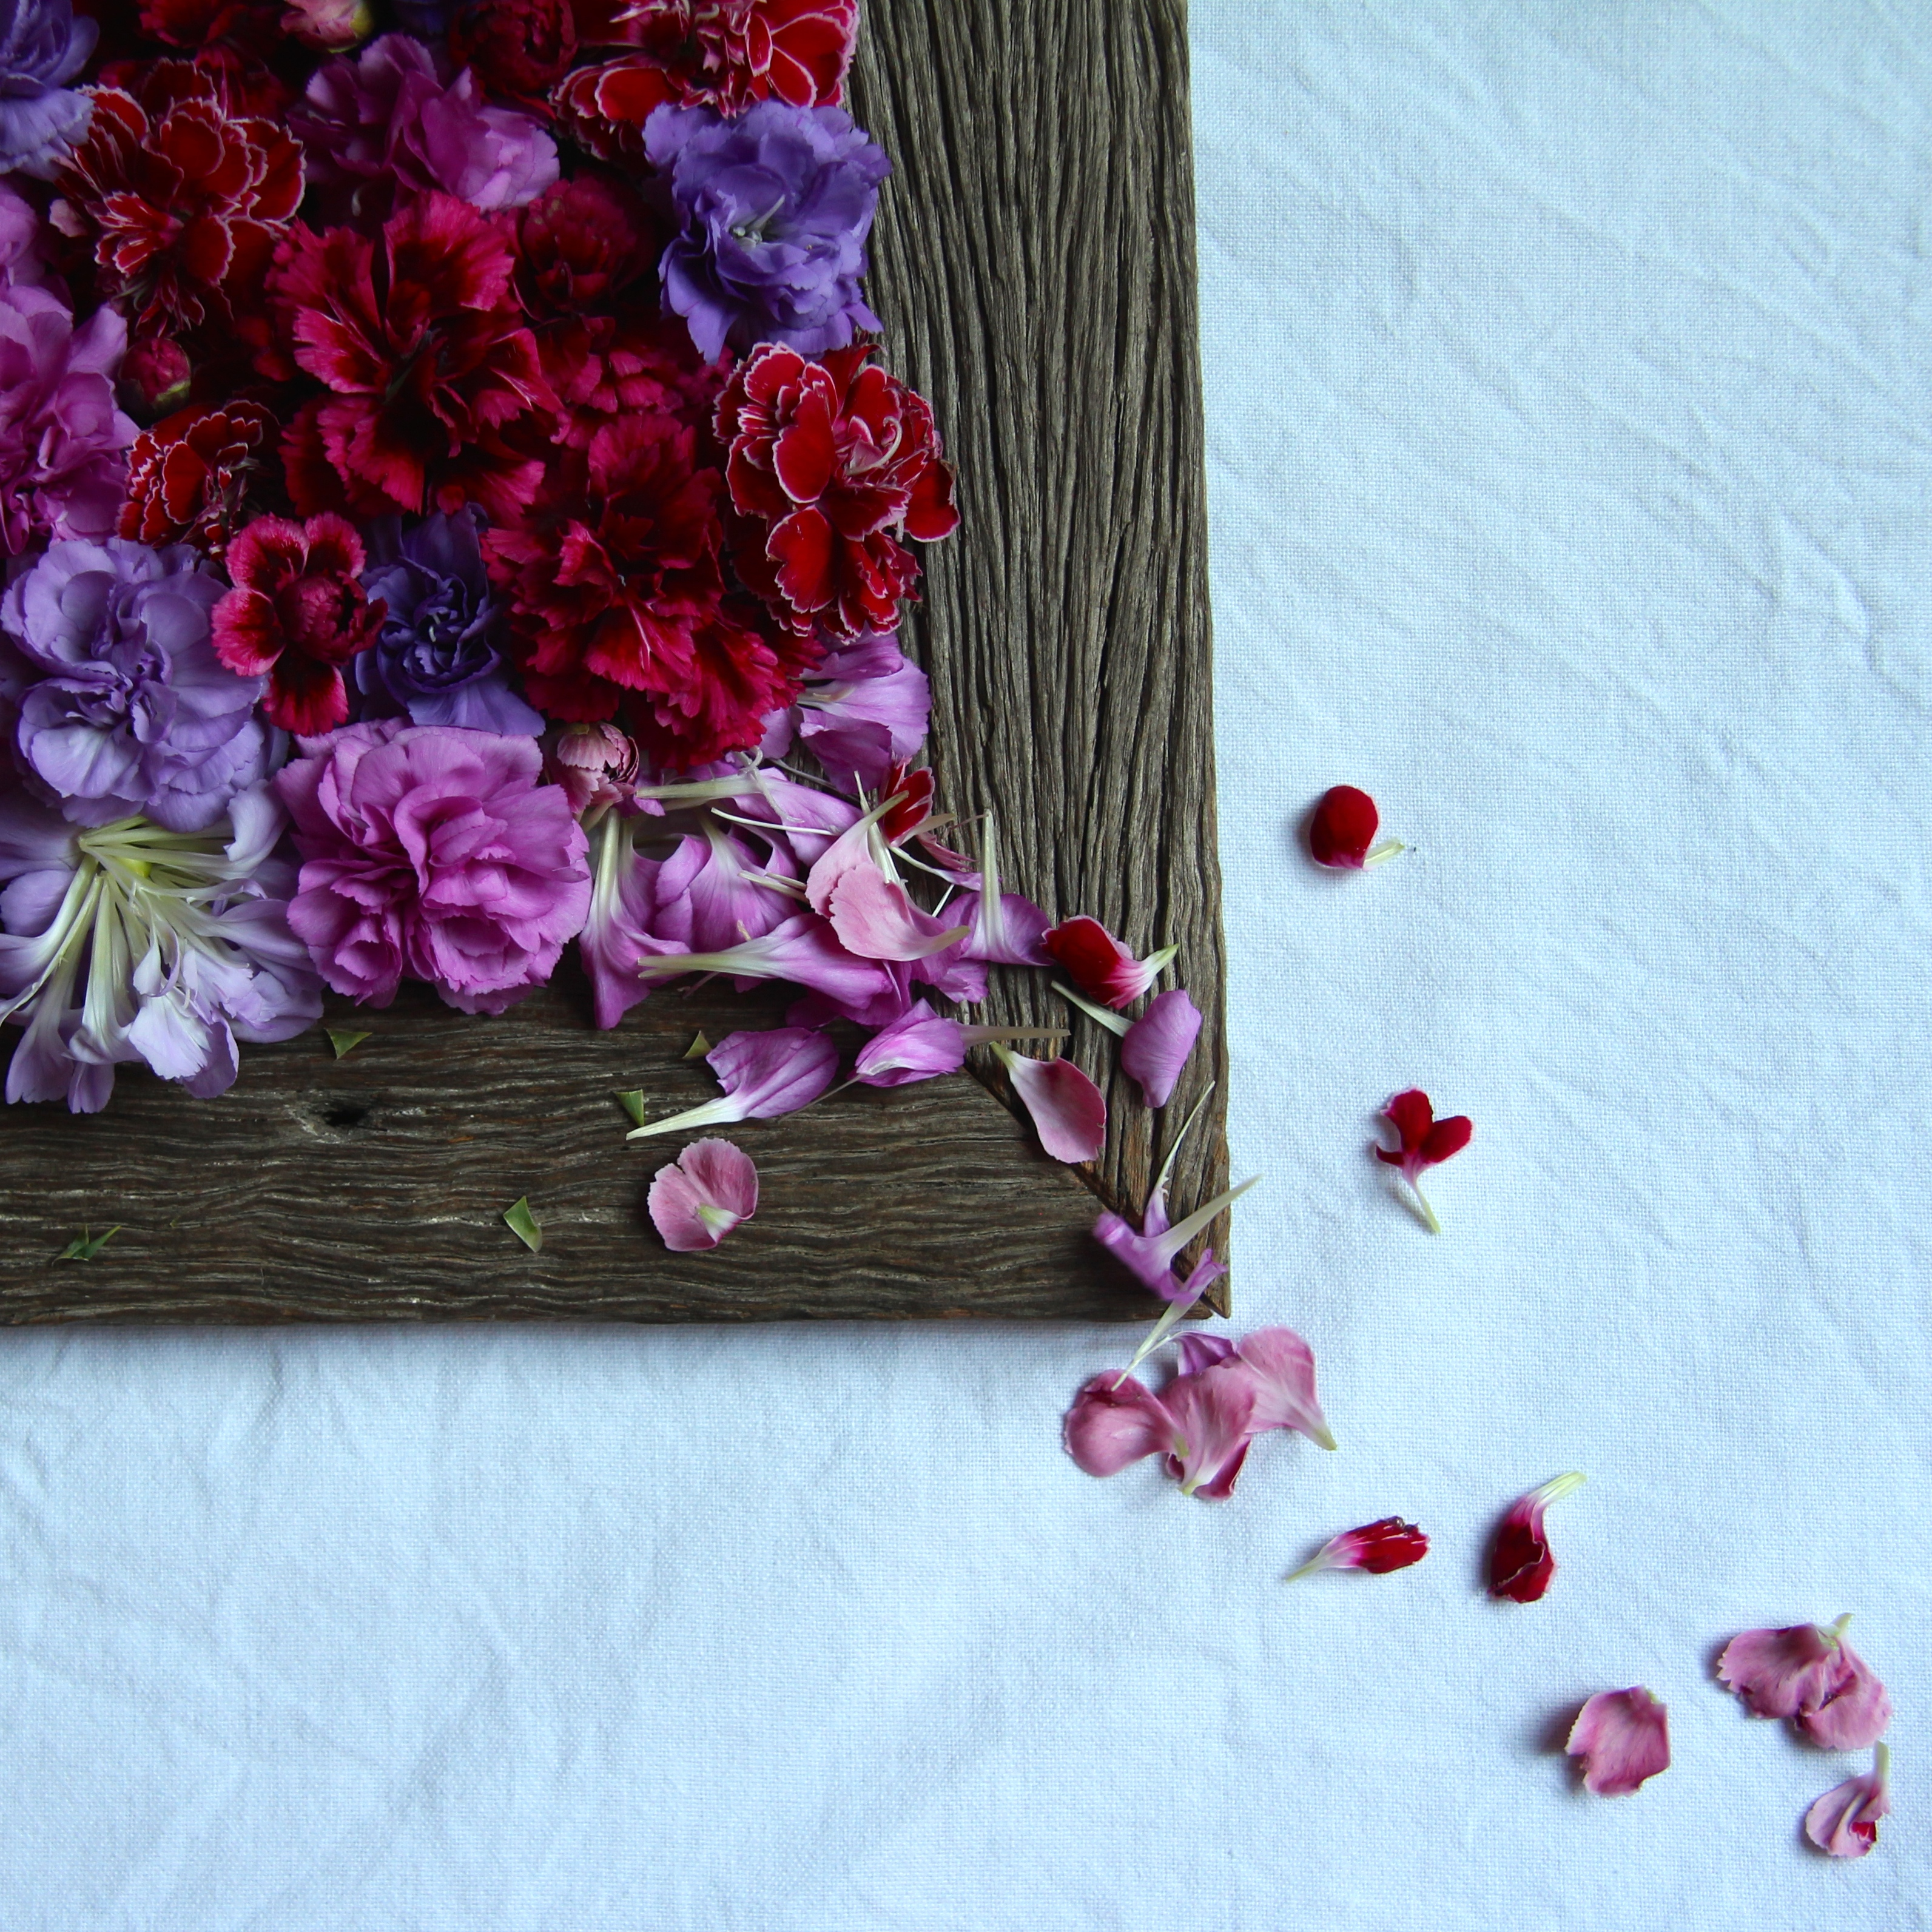 Carnation petals